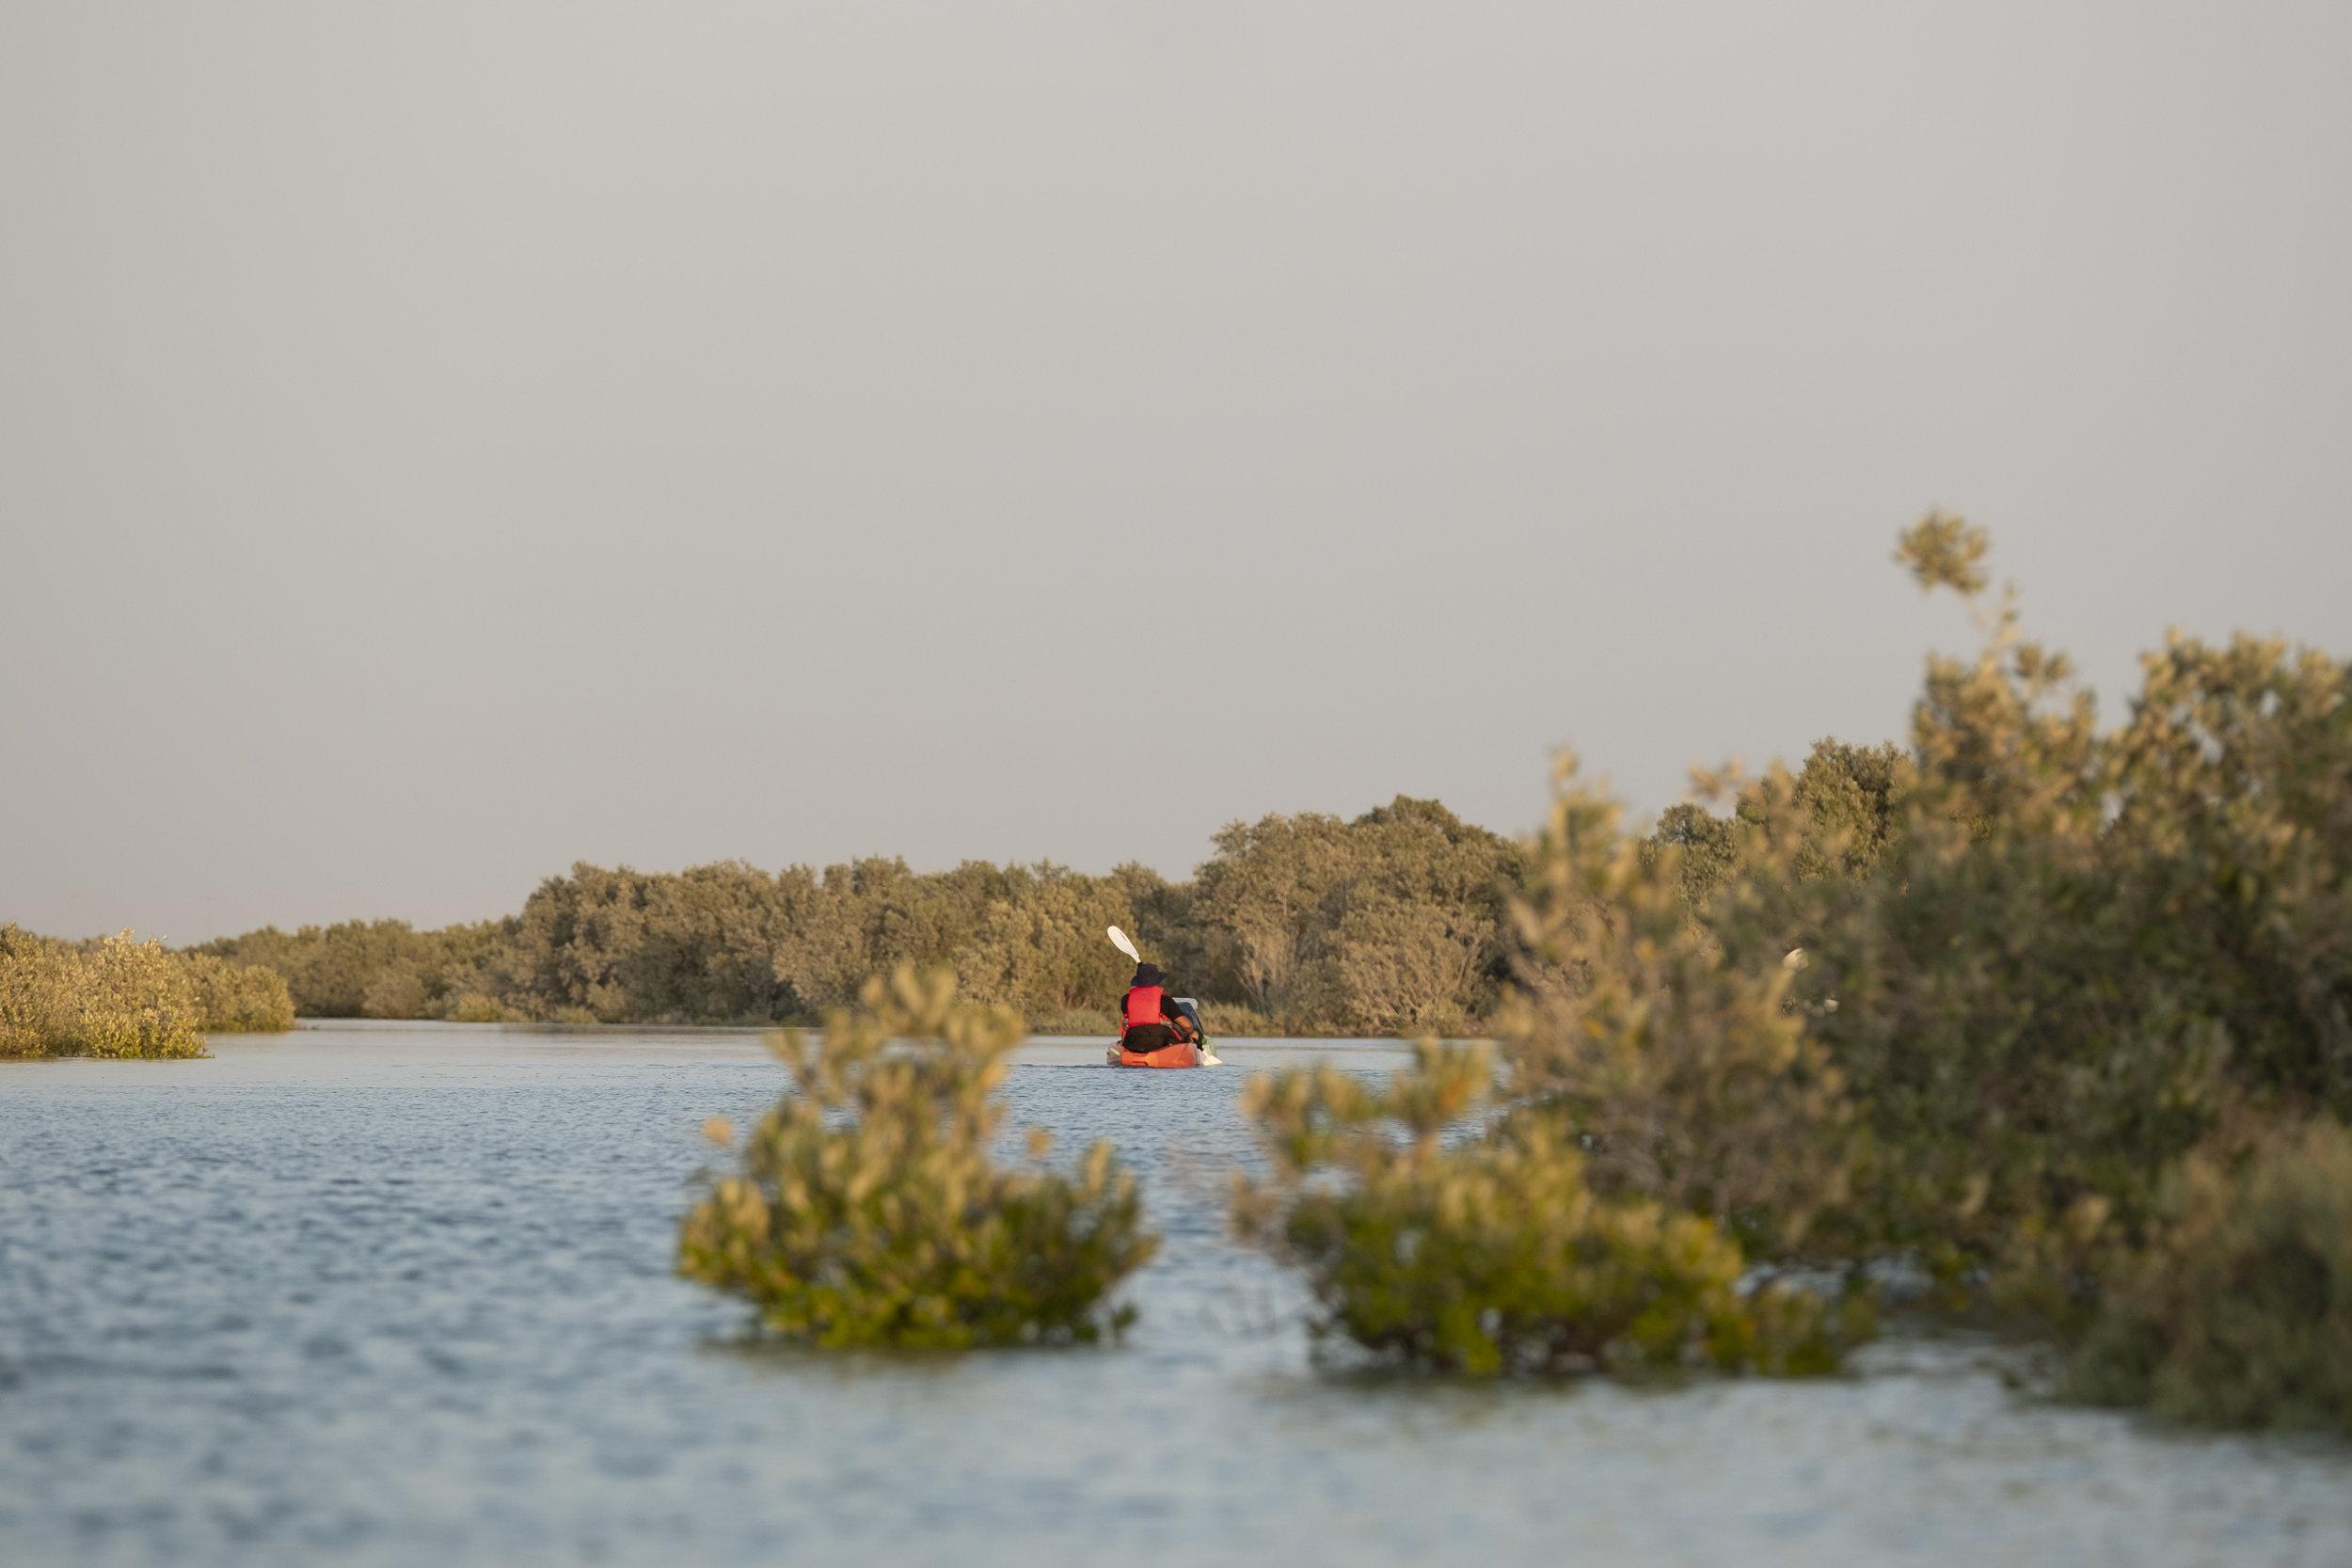 Surrounded by mangroves kayaking_Abu Dhabi_(c)Oliver Wheeldon.jpg